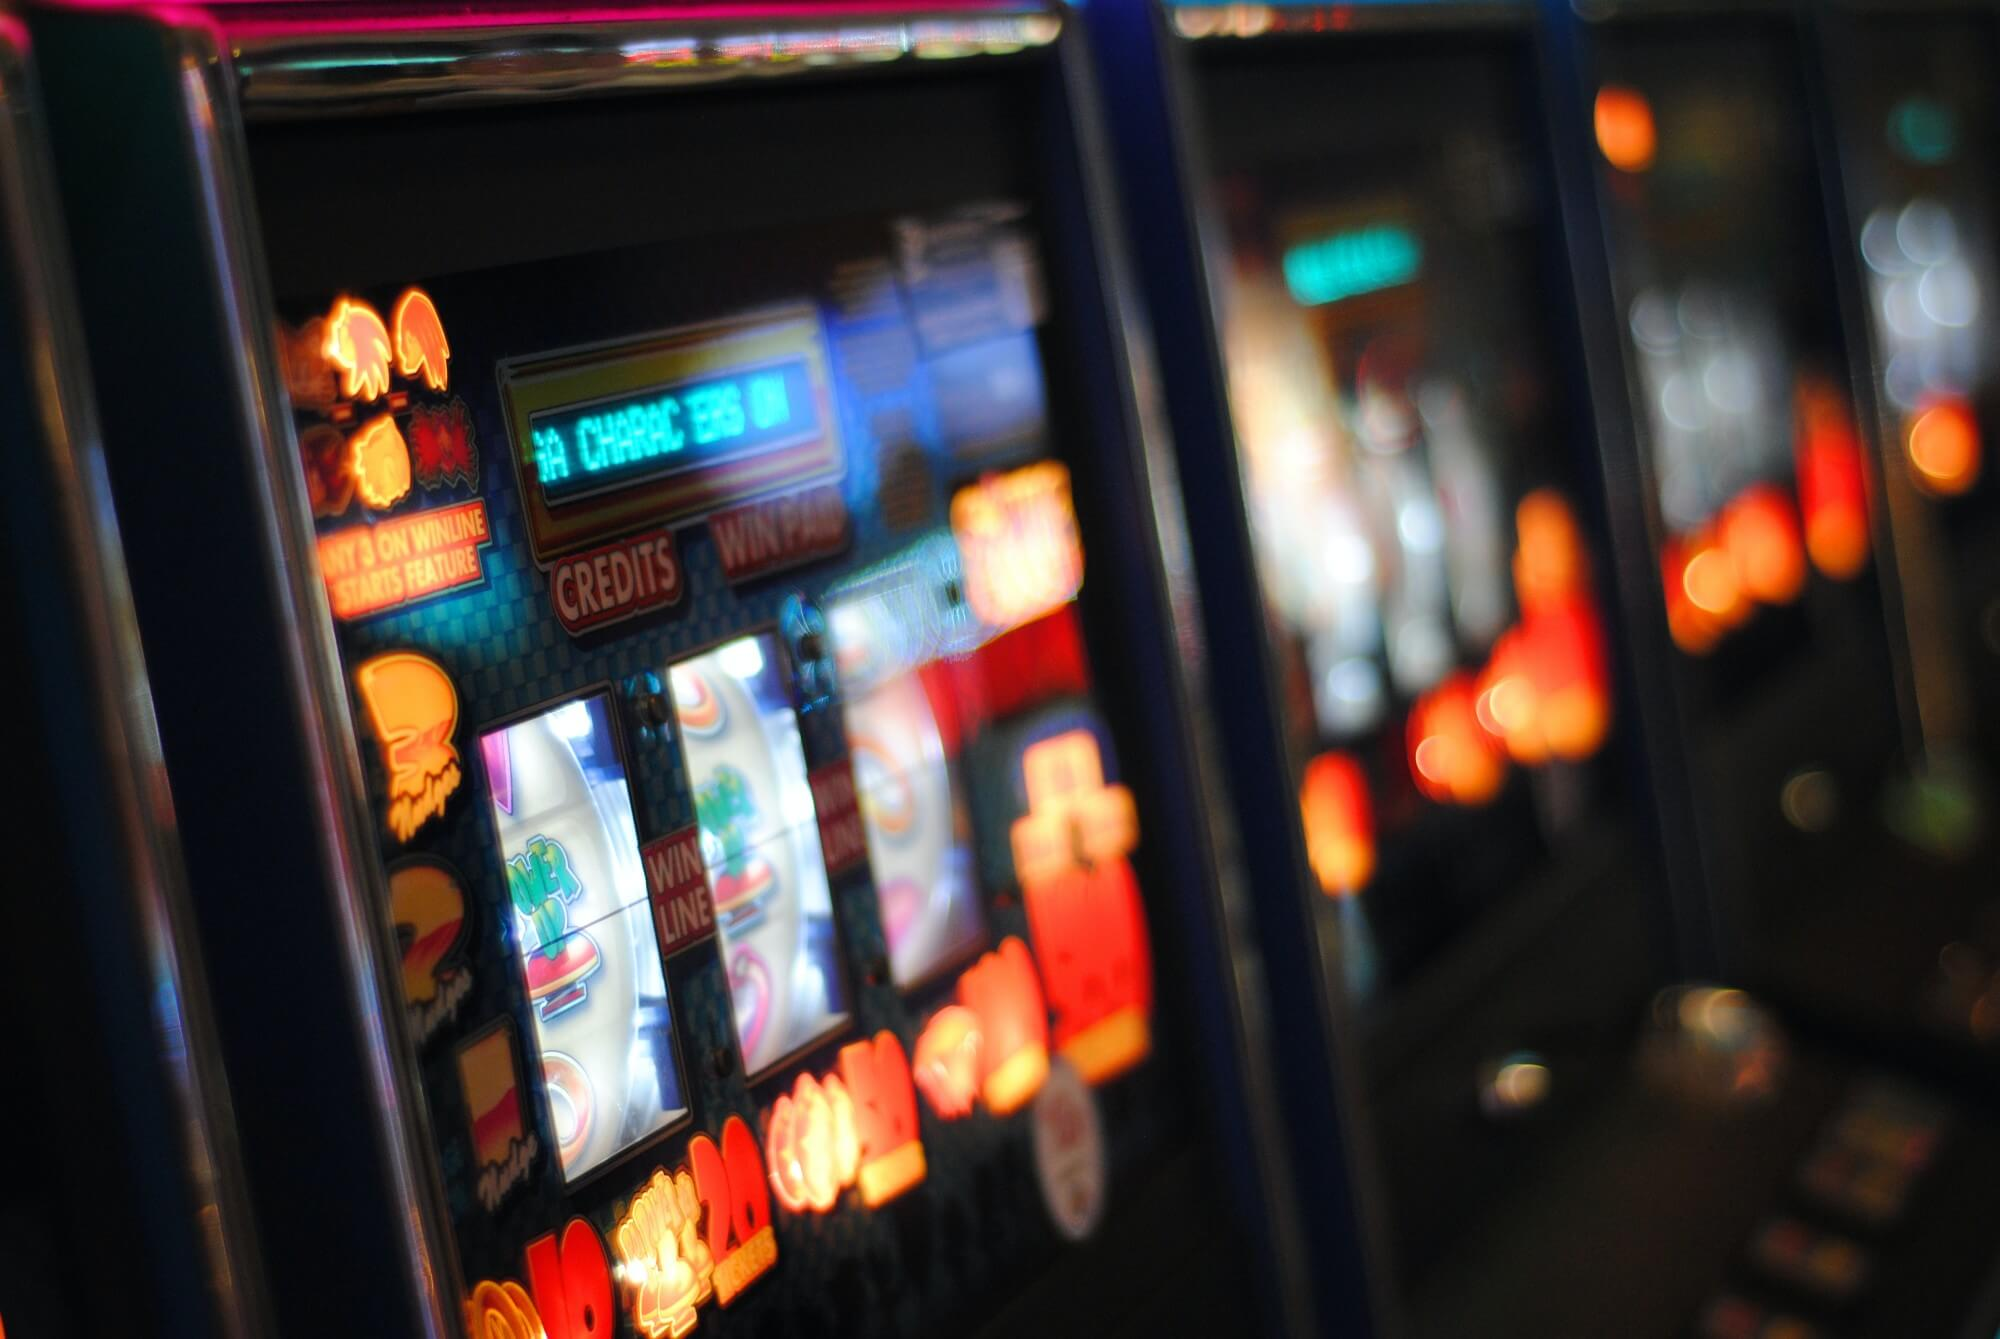 Blurry, close shot of slot machines